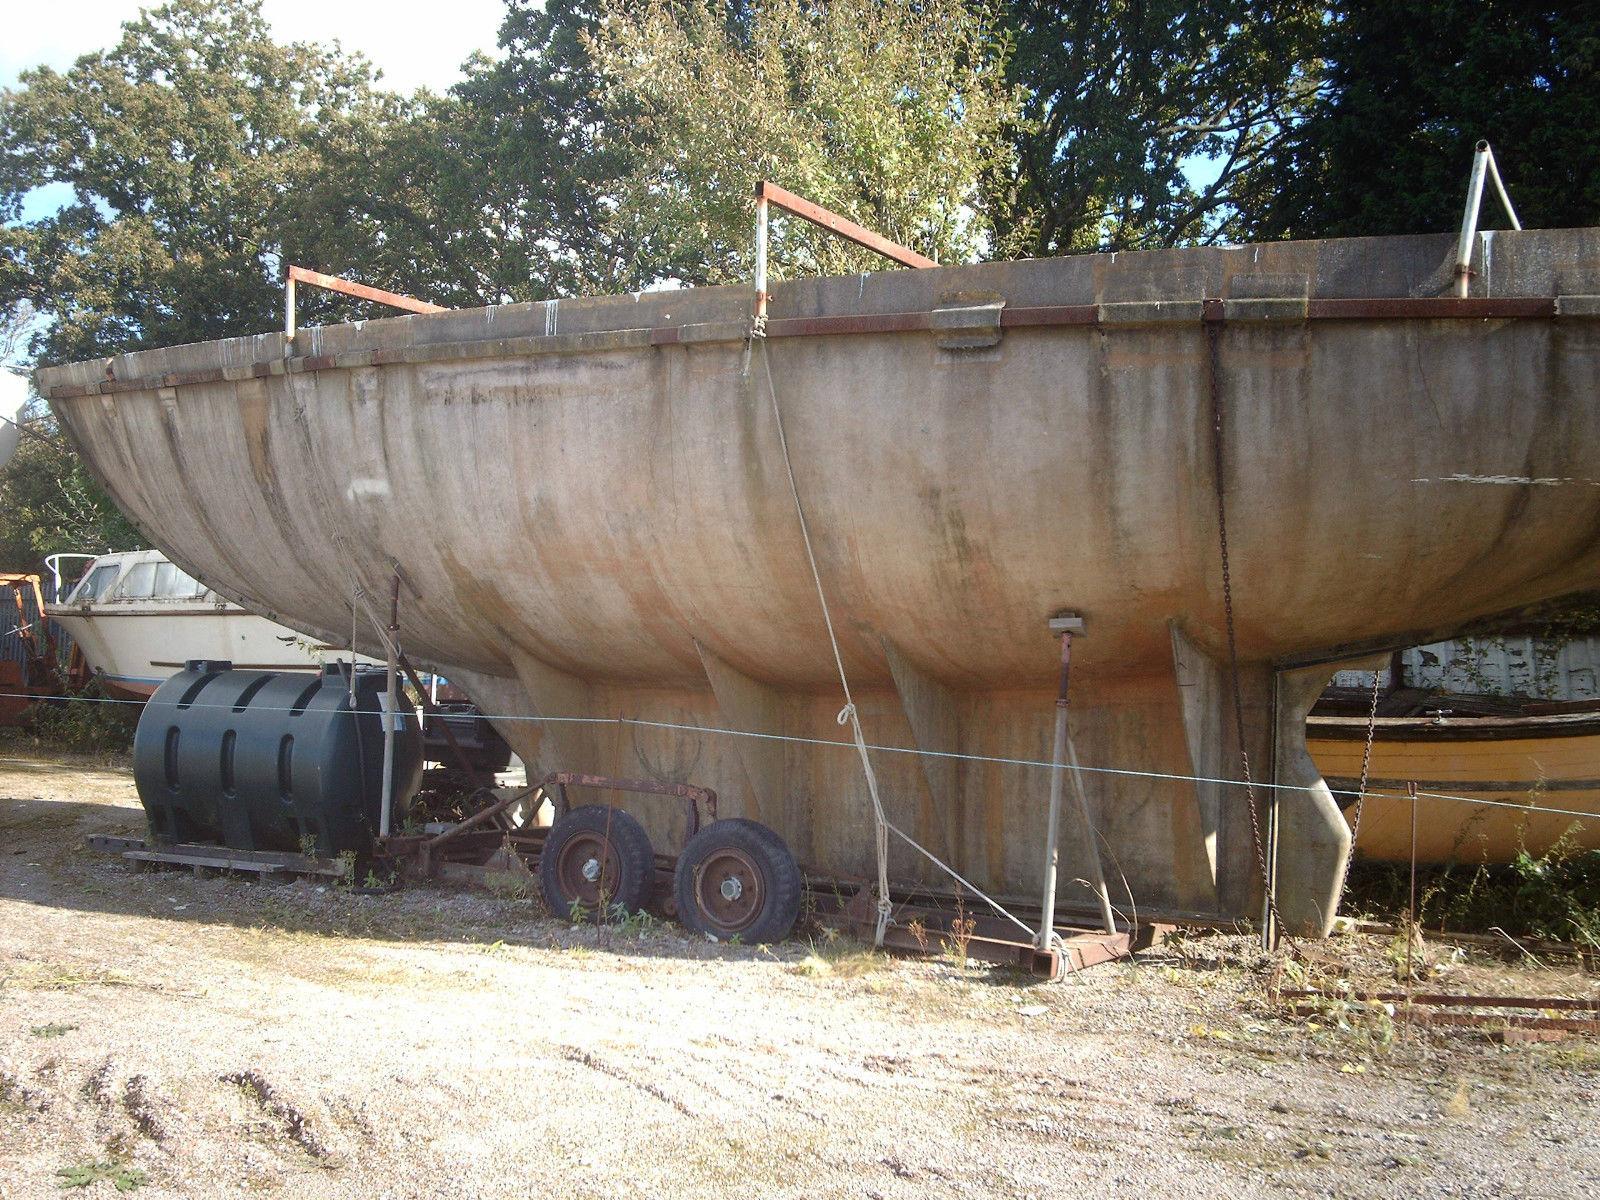 45 Foot yacht mold for sale (Southampton, UK) | Boat Design Net